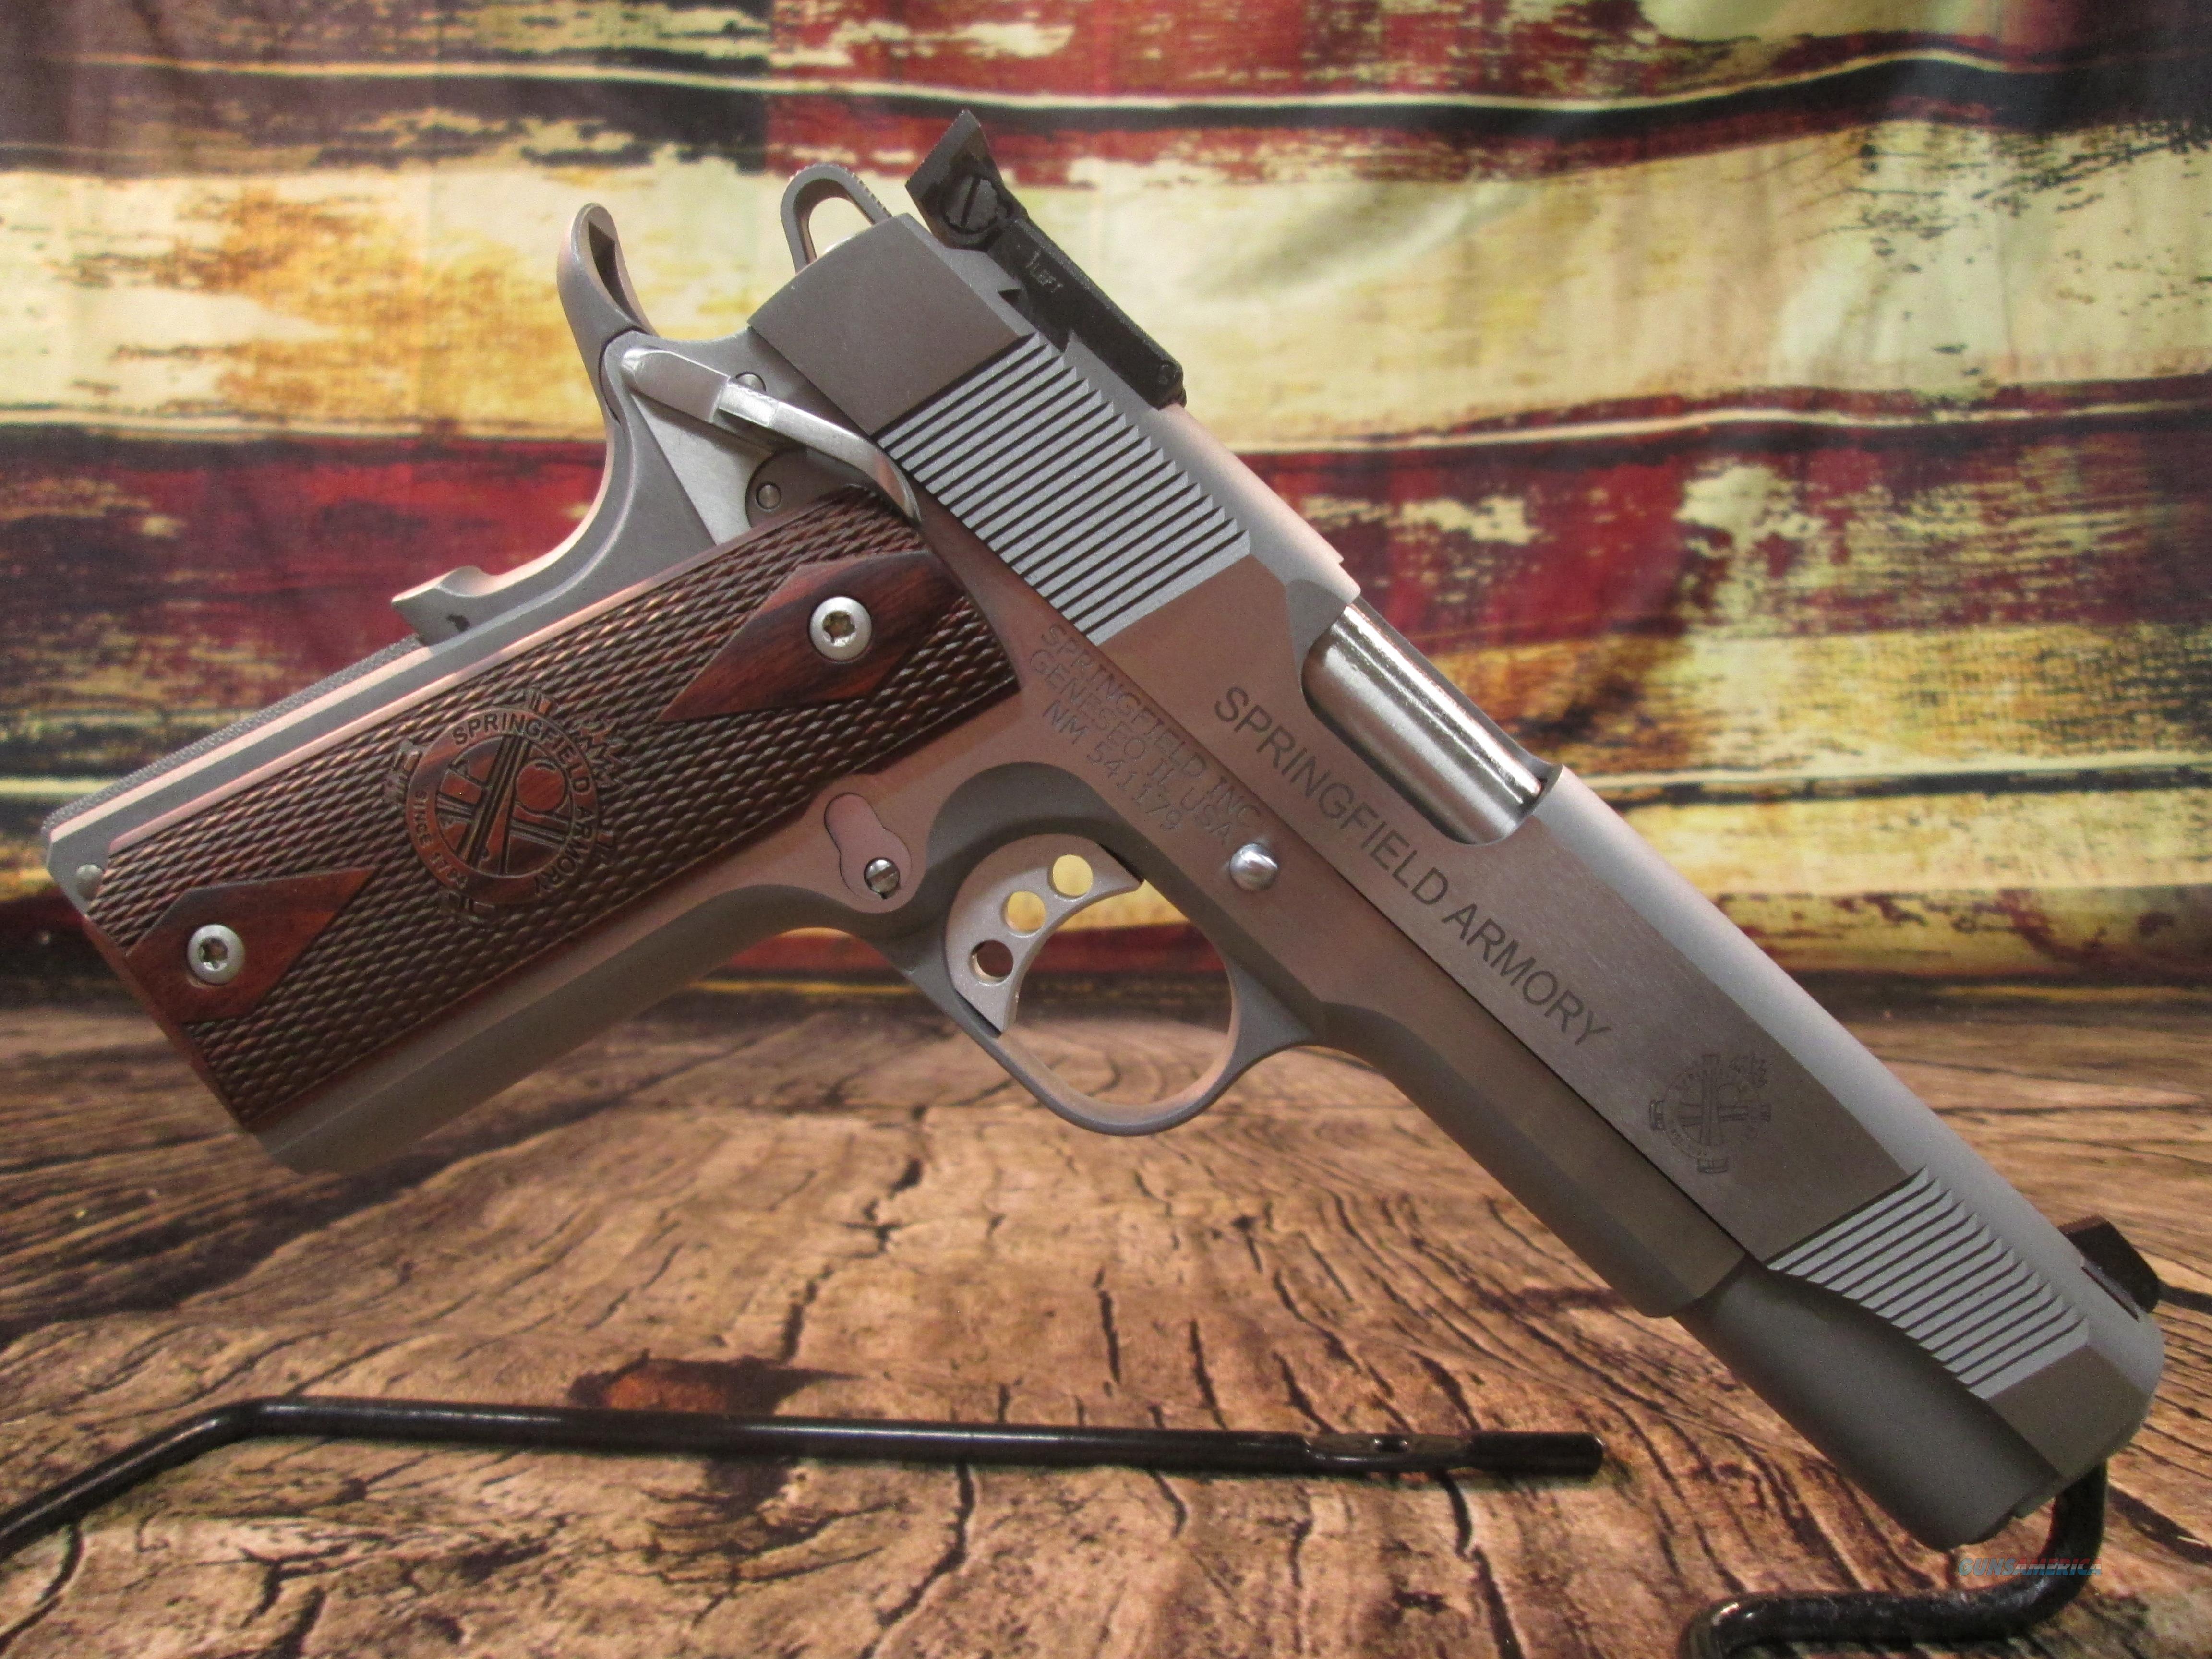 SPRINGFIELD TARGET 1911 45ACP NEW (PI9132LCA)  Guns > Pistols > Springfield Armory Pistols > 1911 Type